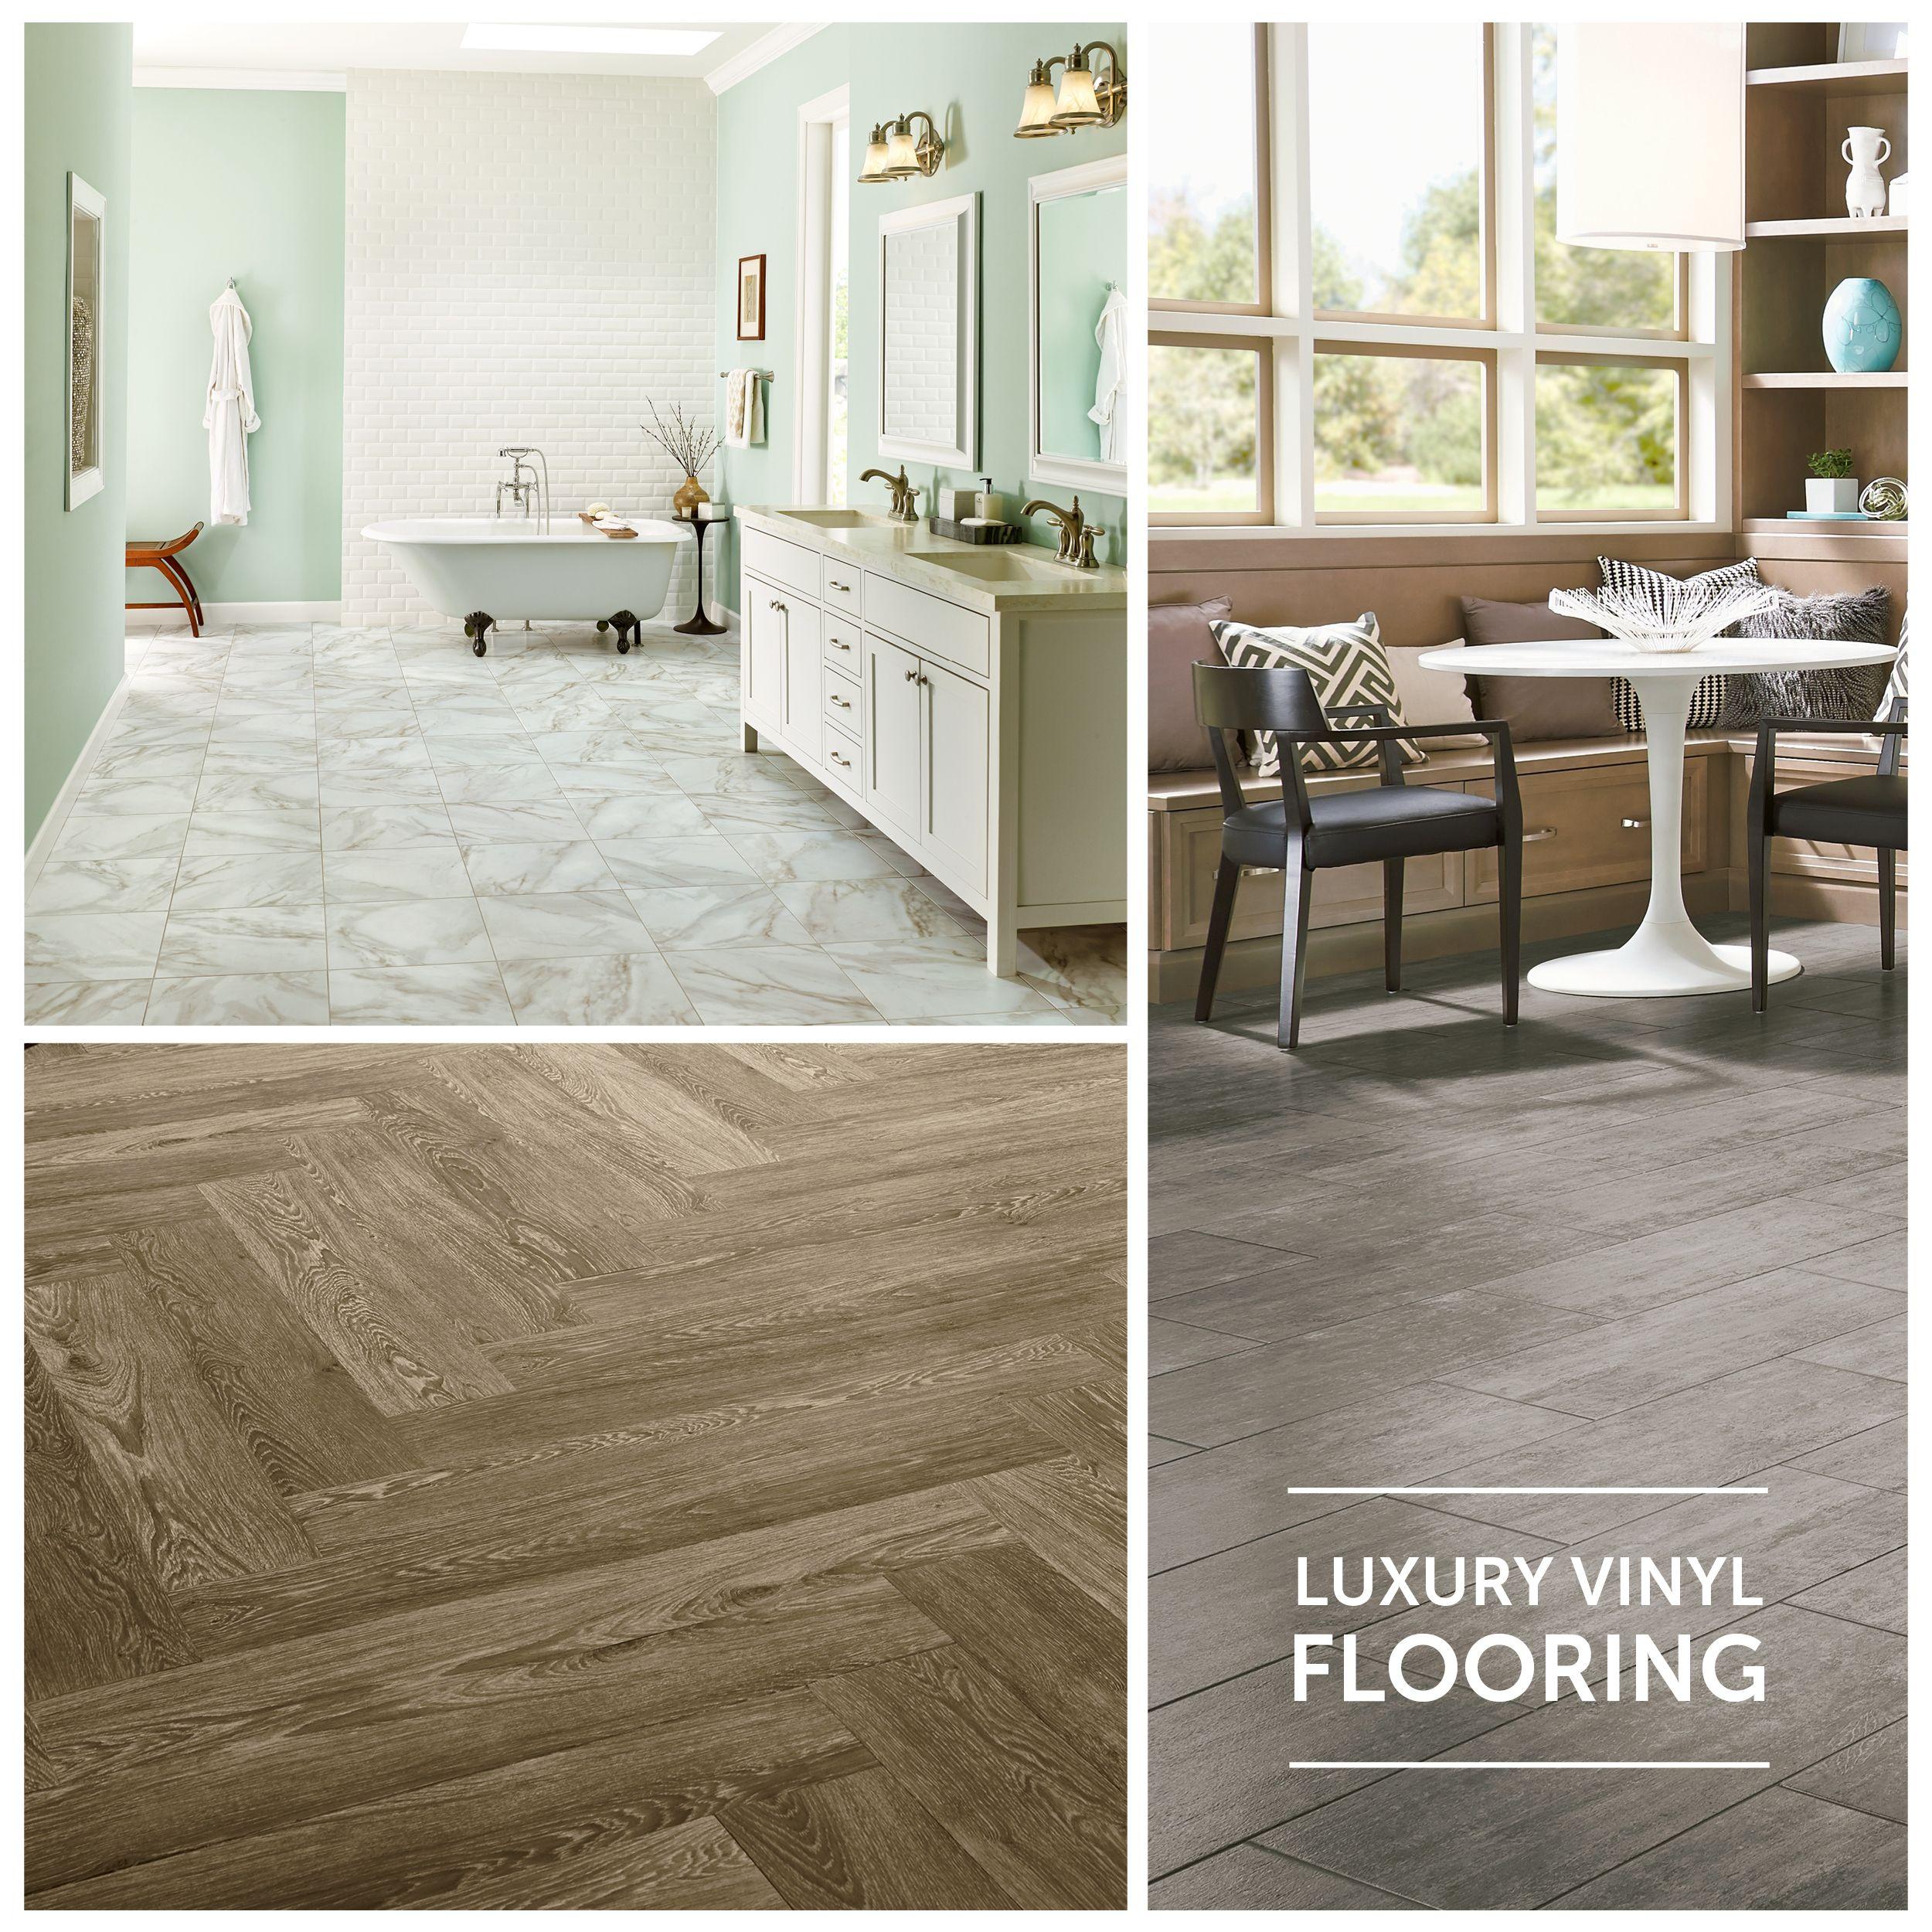 Install A Warm Moisture Resistant Basement Subfloor In A Day: LVP Herringbone Floors Basement Reveal Office Inspo Kitchen